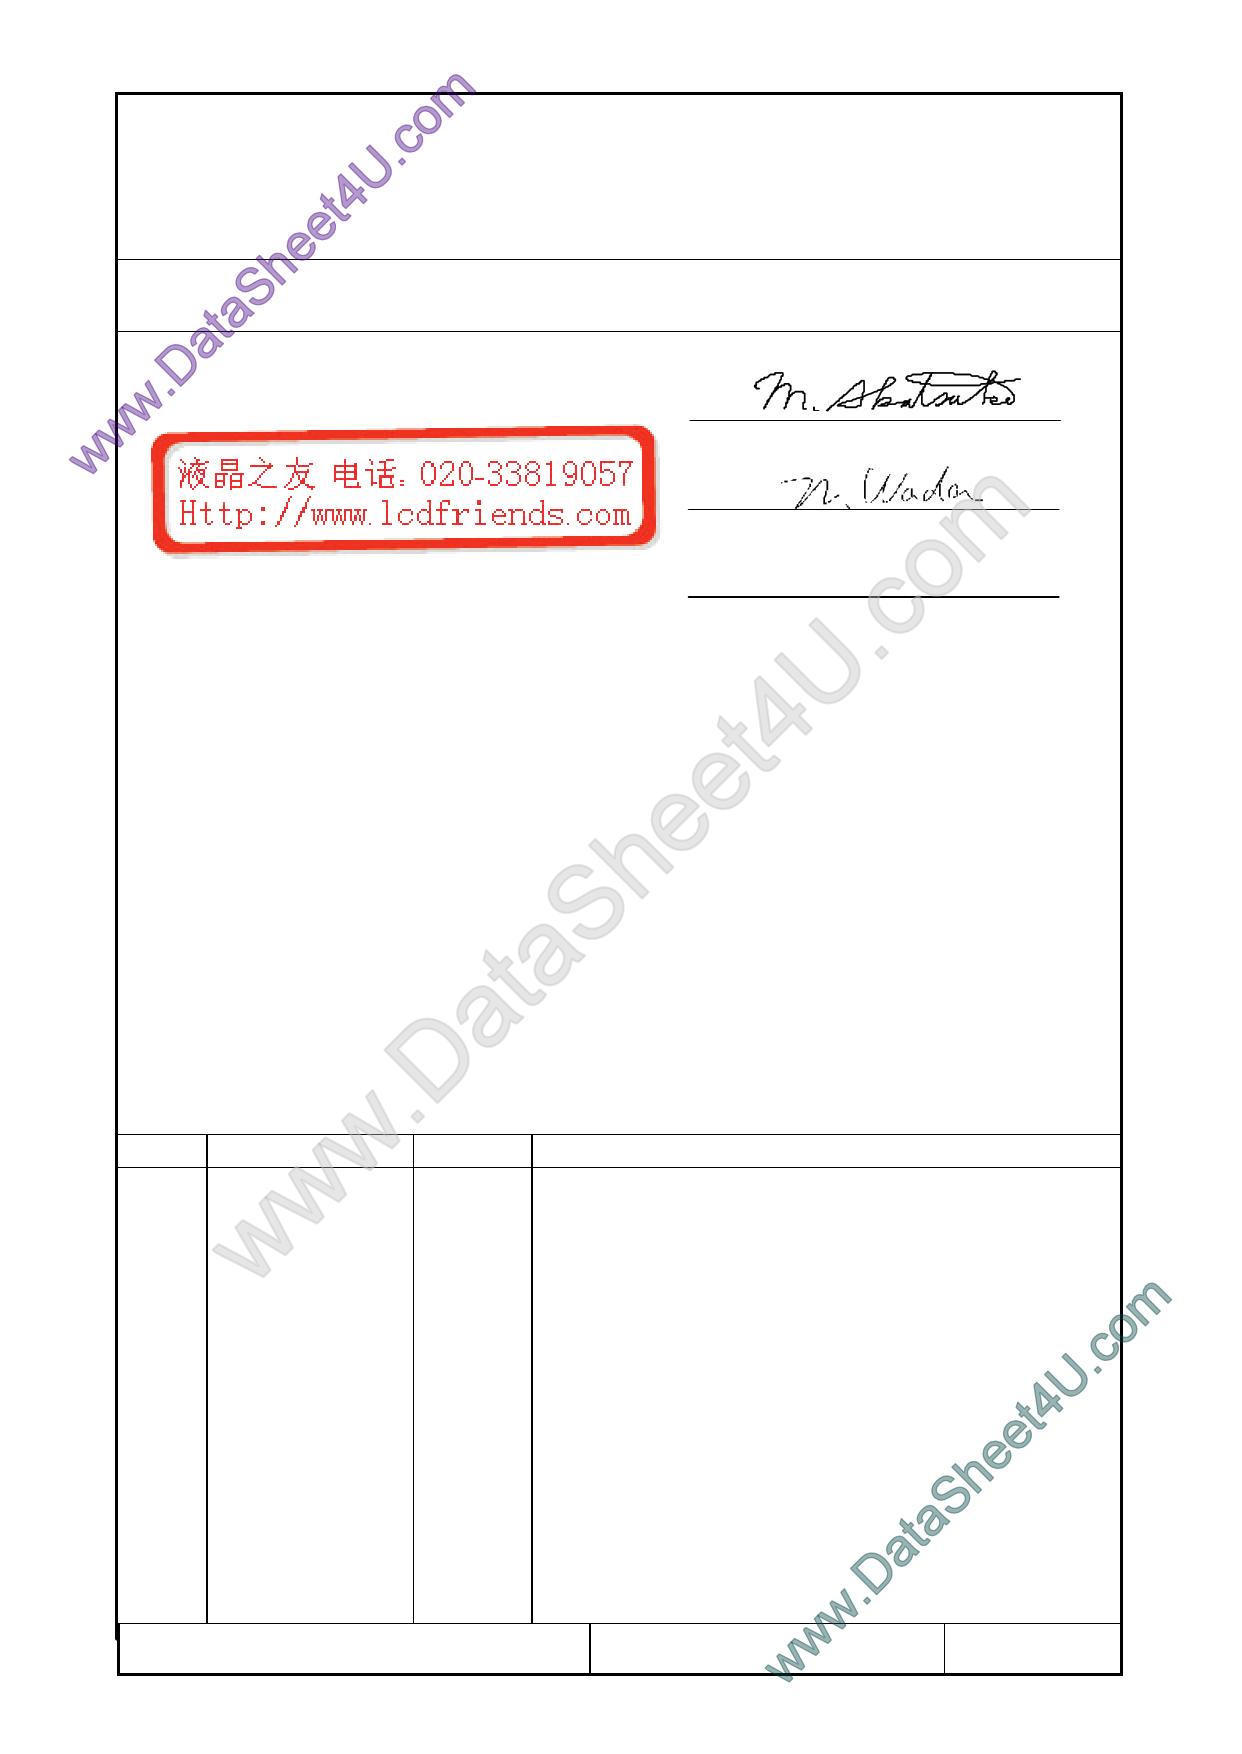 F-51851GNGQJ-LG-ACN Даташит, Описание, Даташиты